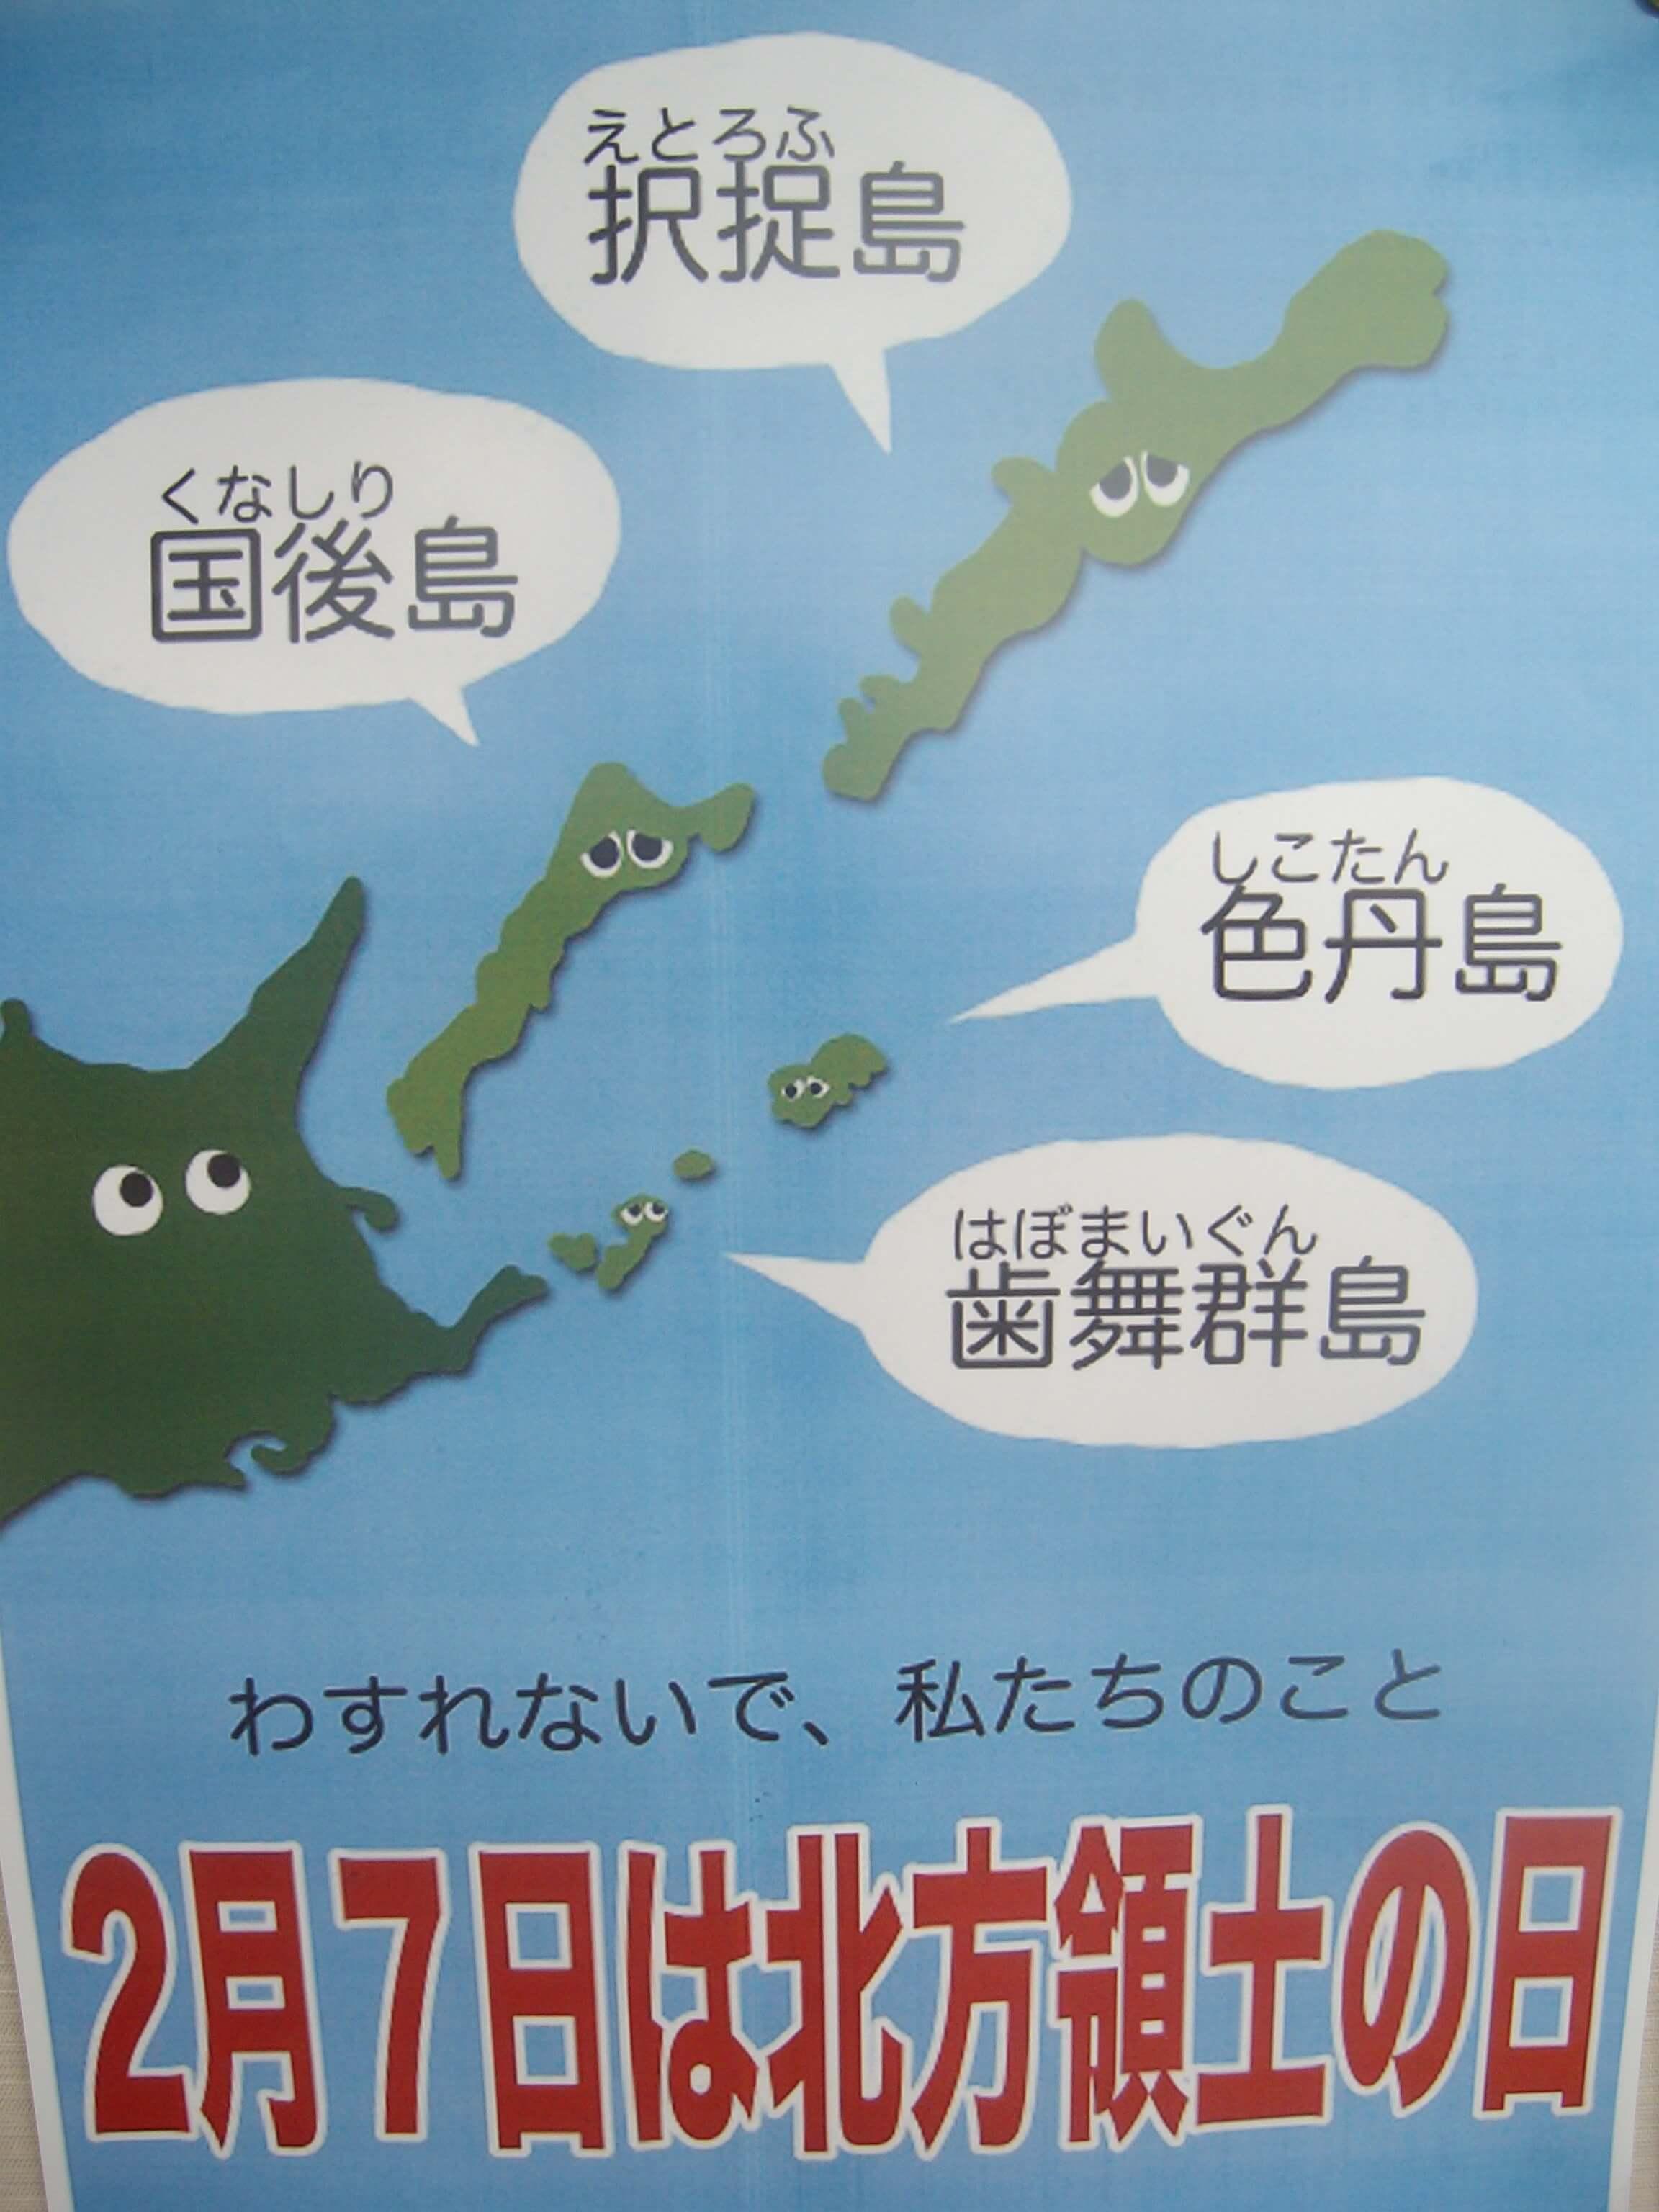 Kuril Islands propaganda